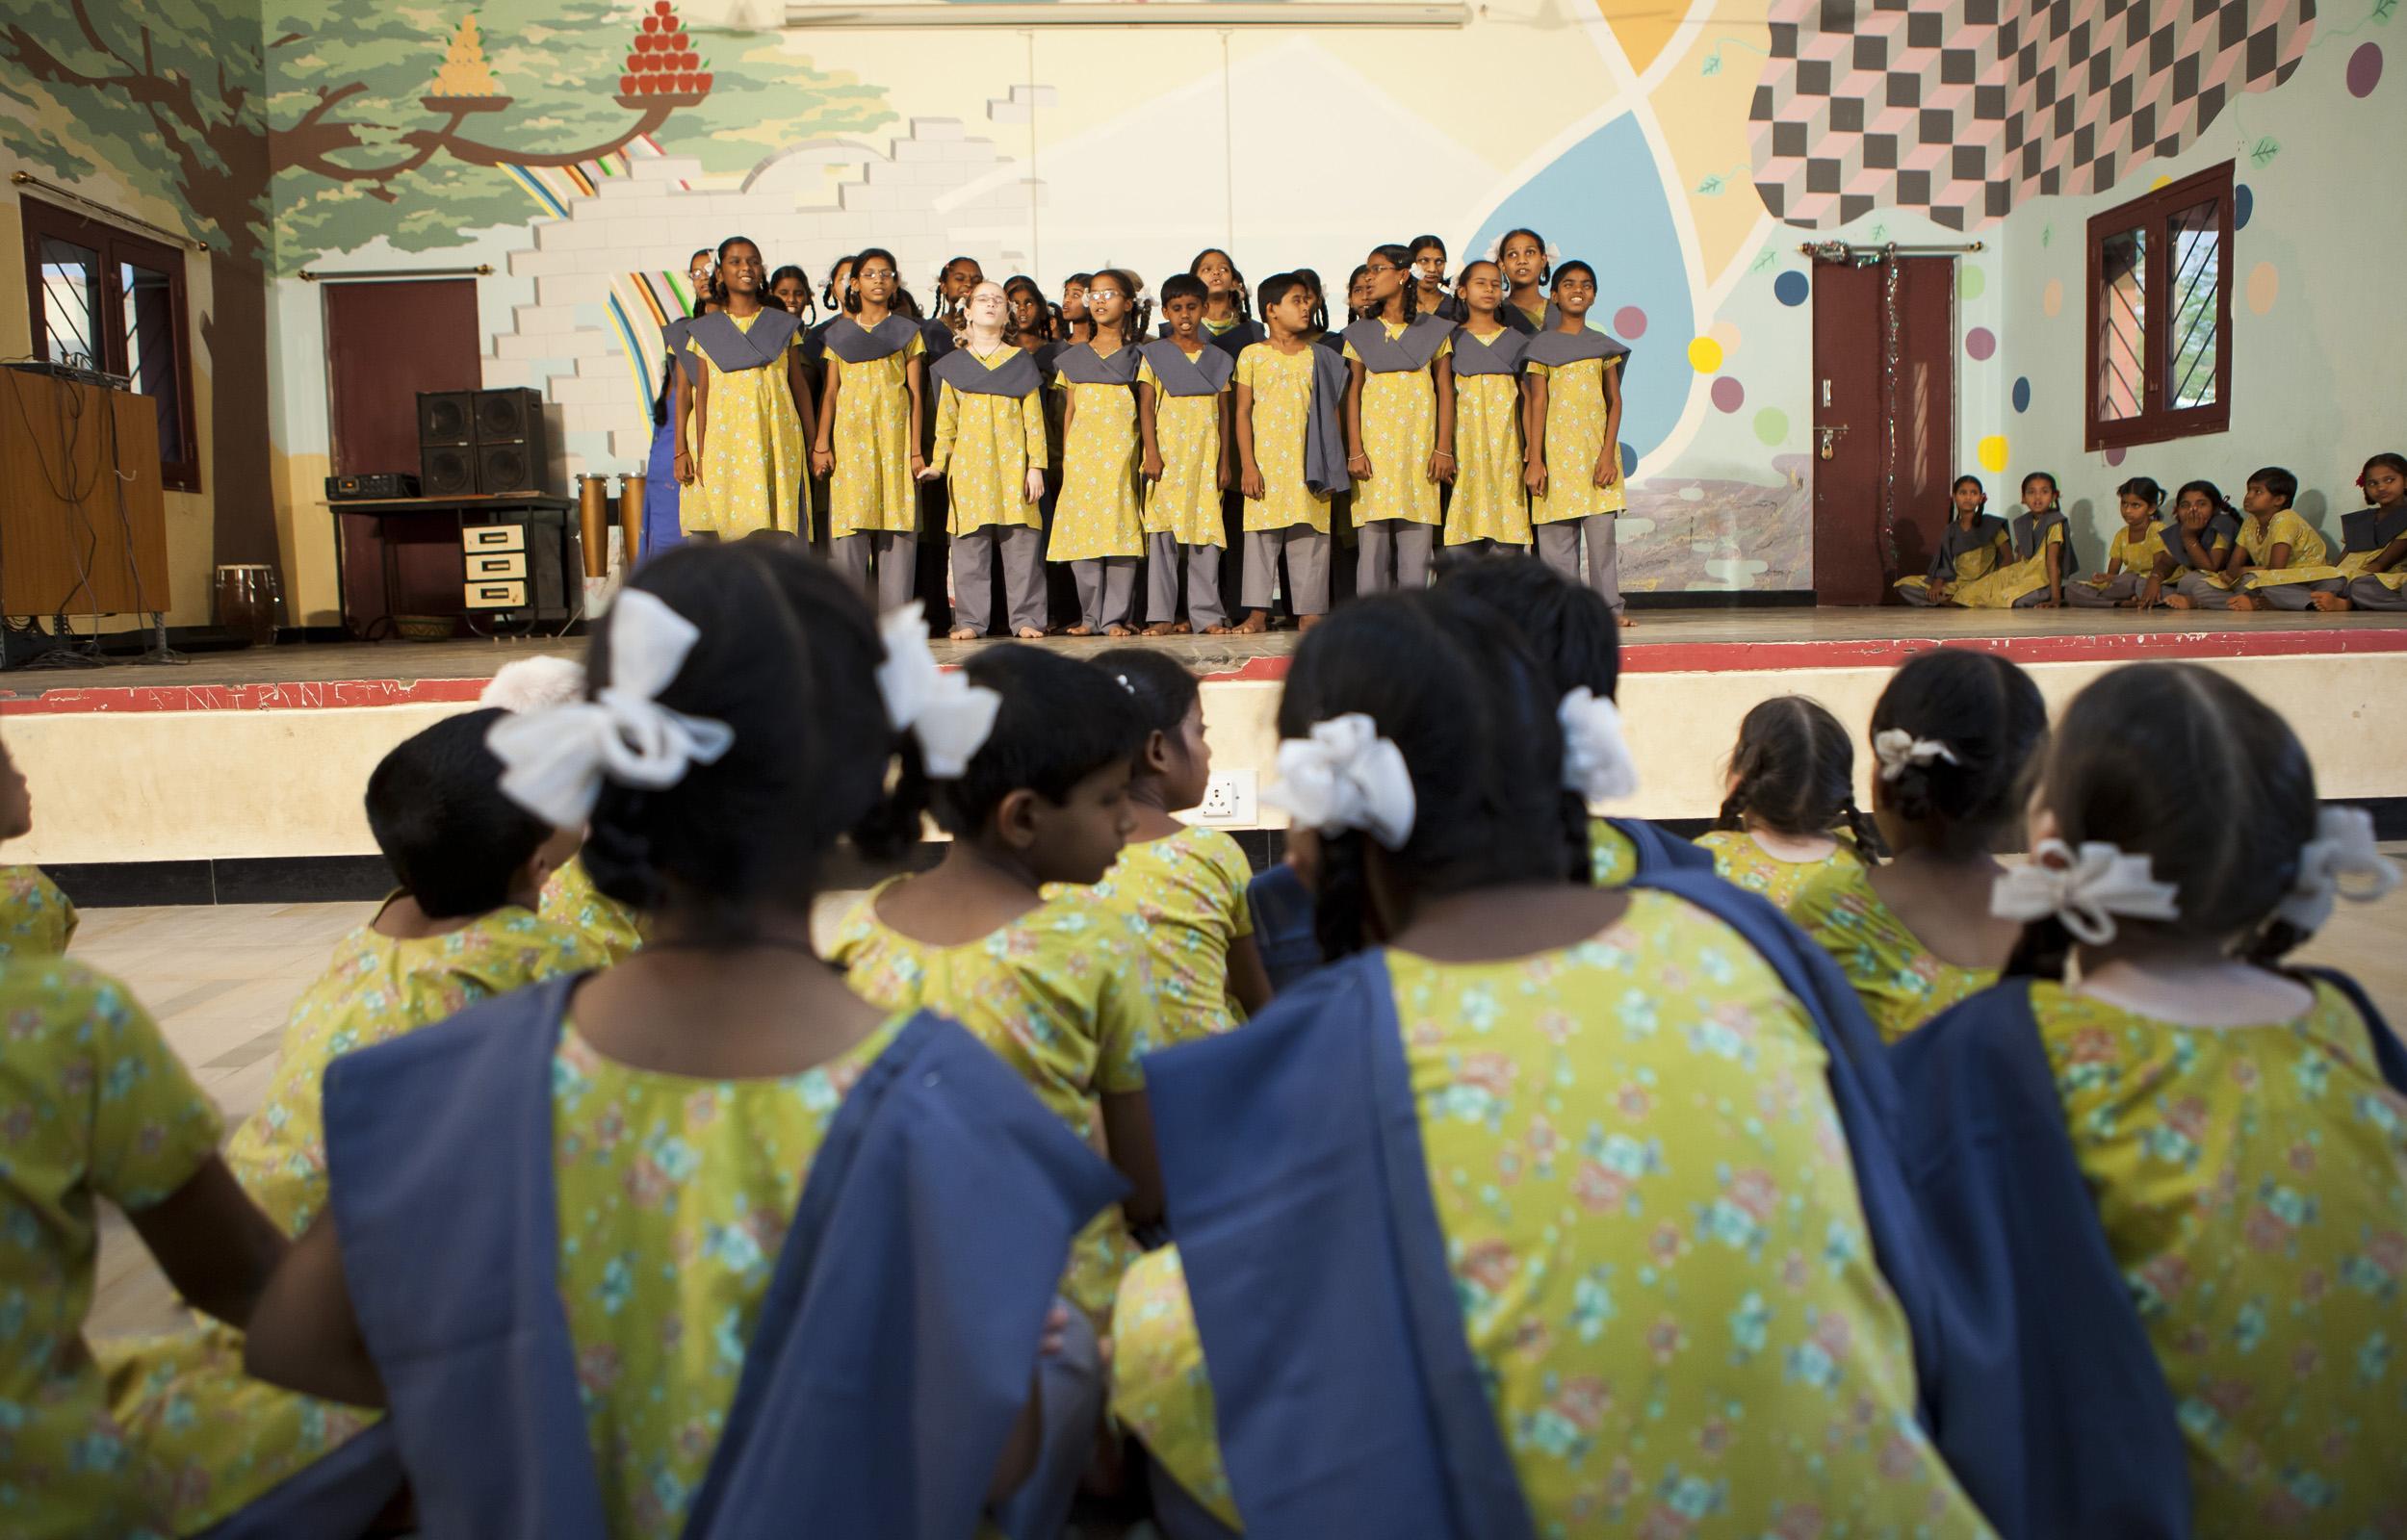 2012_03_17_vicente_ferrer_escuelas10.jpg